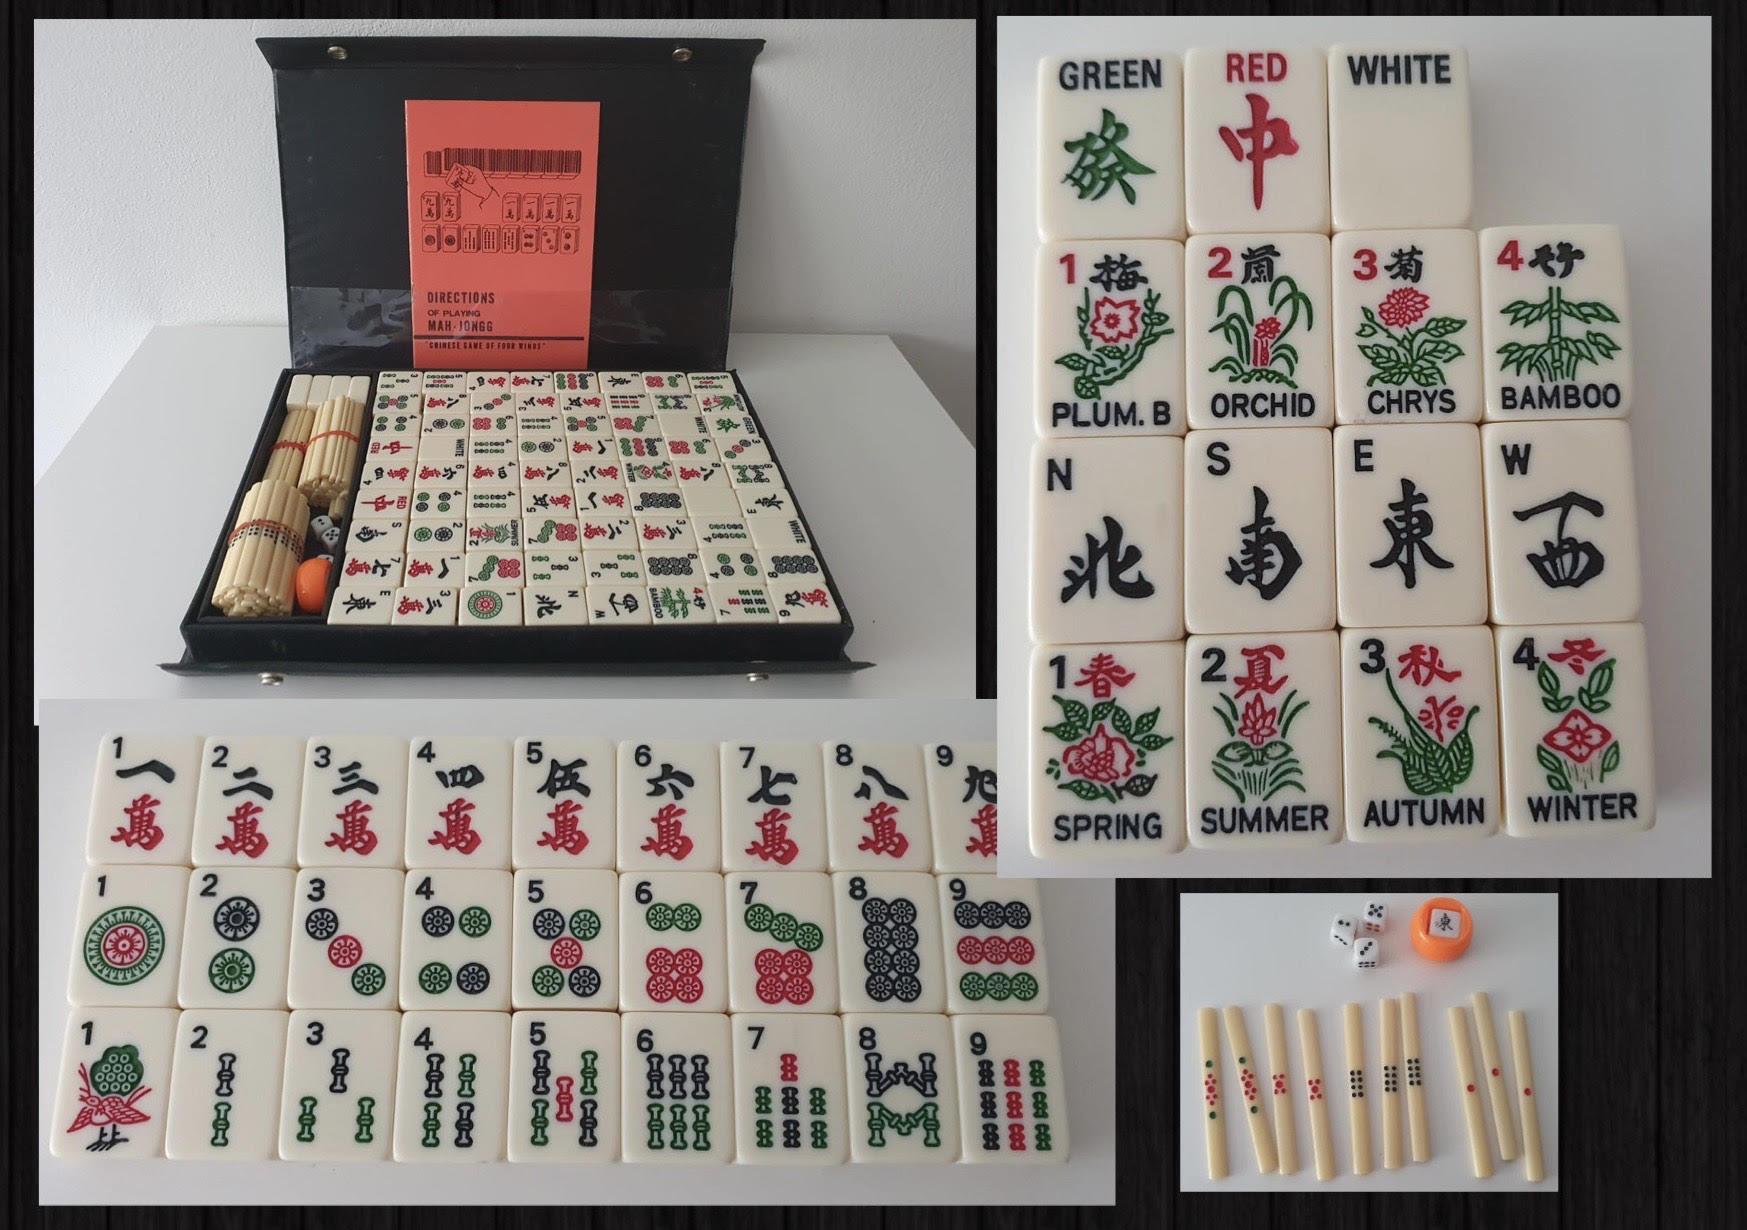 Mahjong - 3000 let stará čínská hra